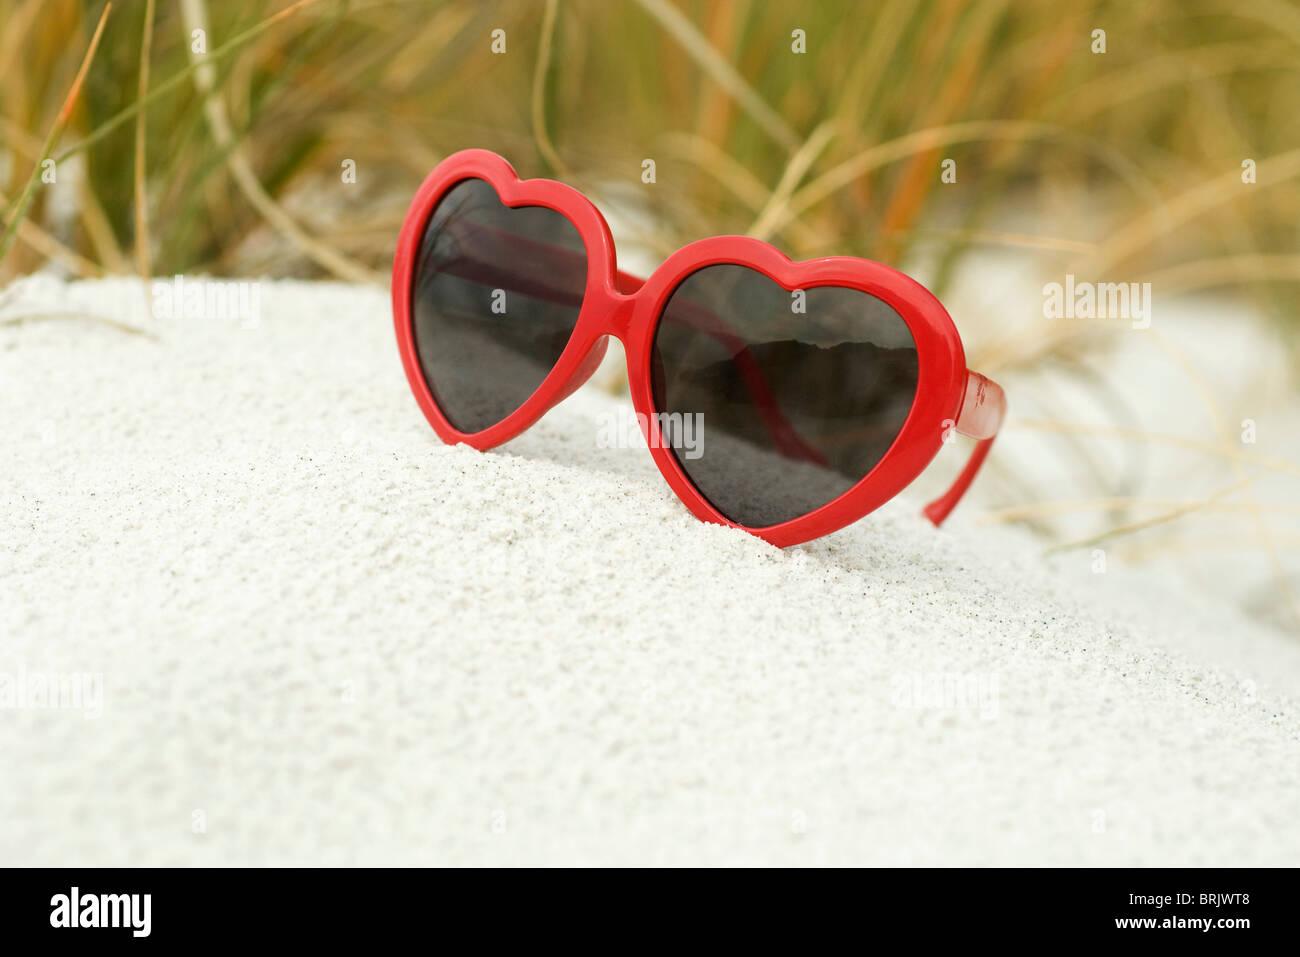 c23b5cac5f8a Heart Sunglasses Stock Photos   Heart Sunglasses Stock Images - Alamy